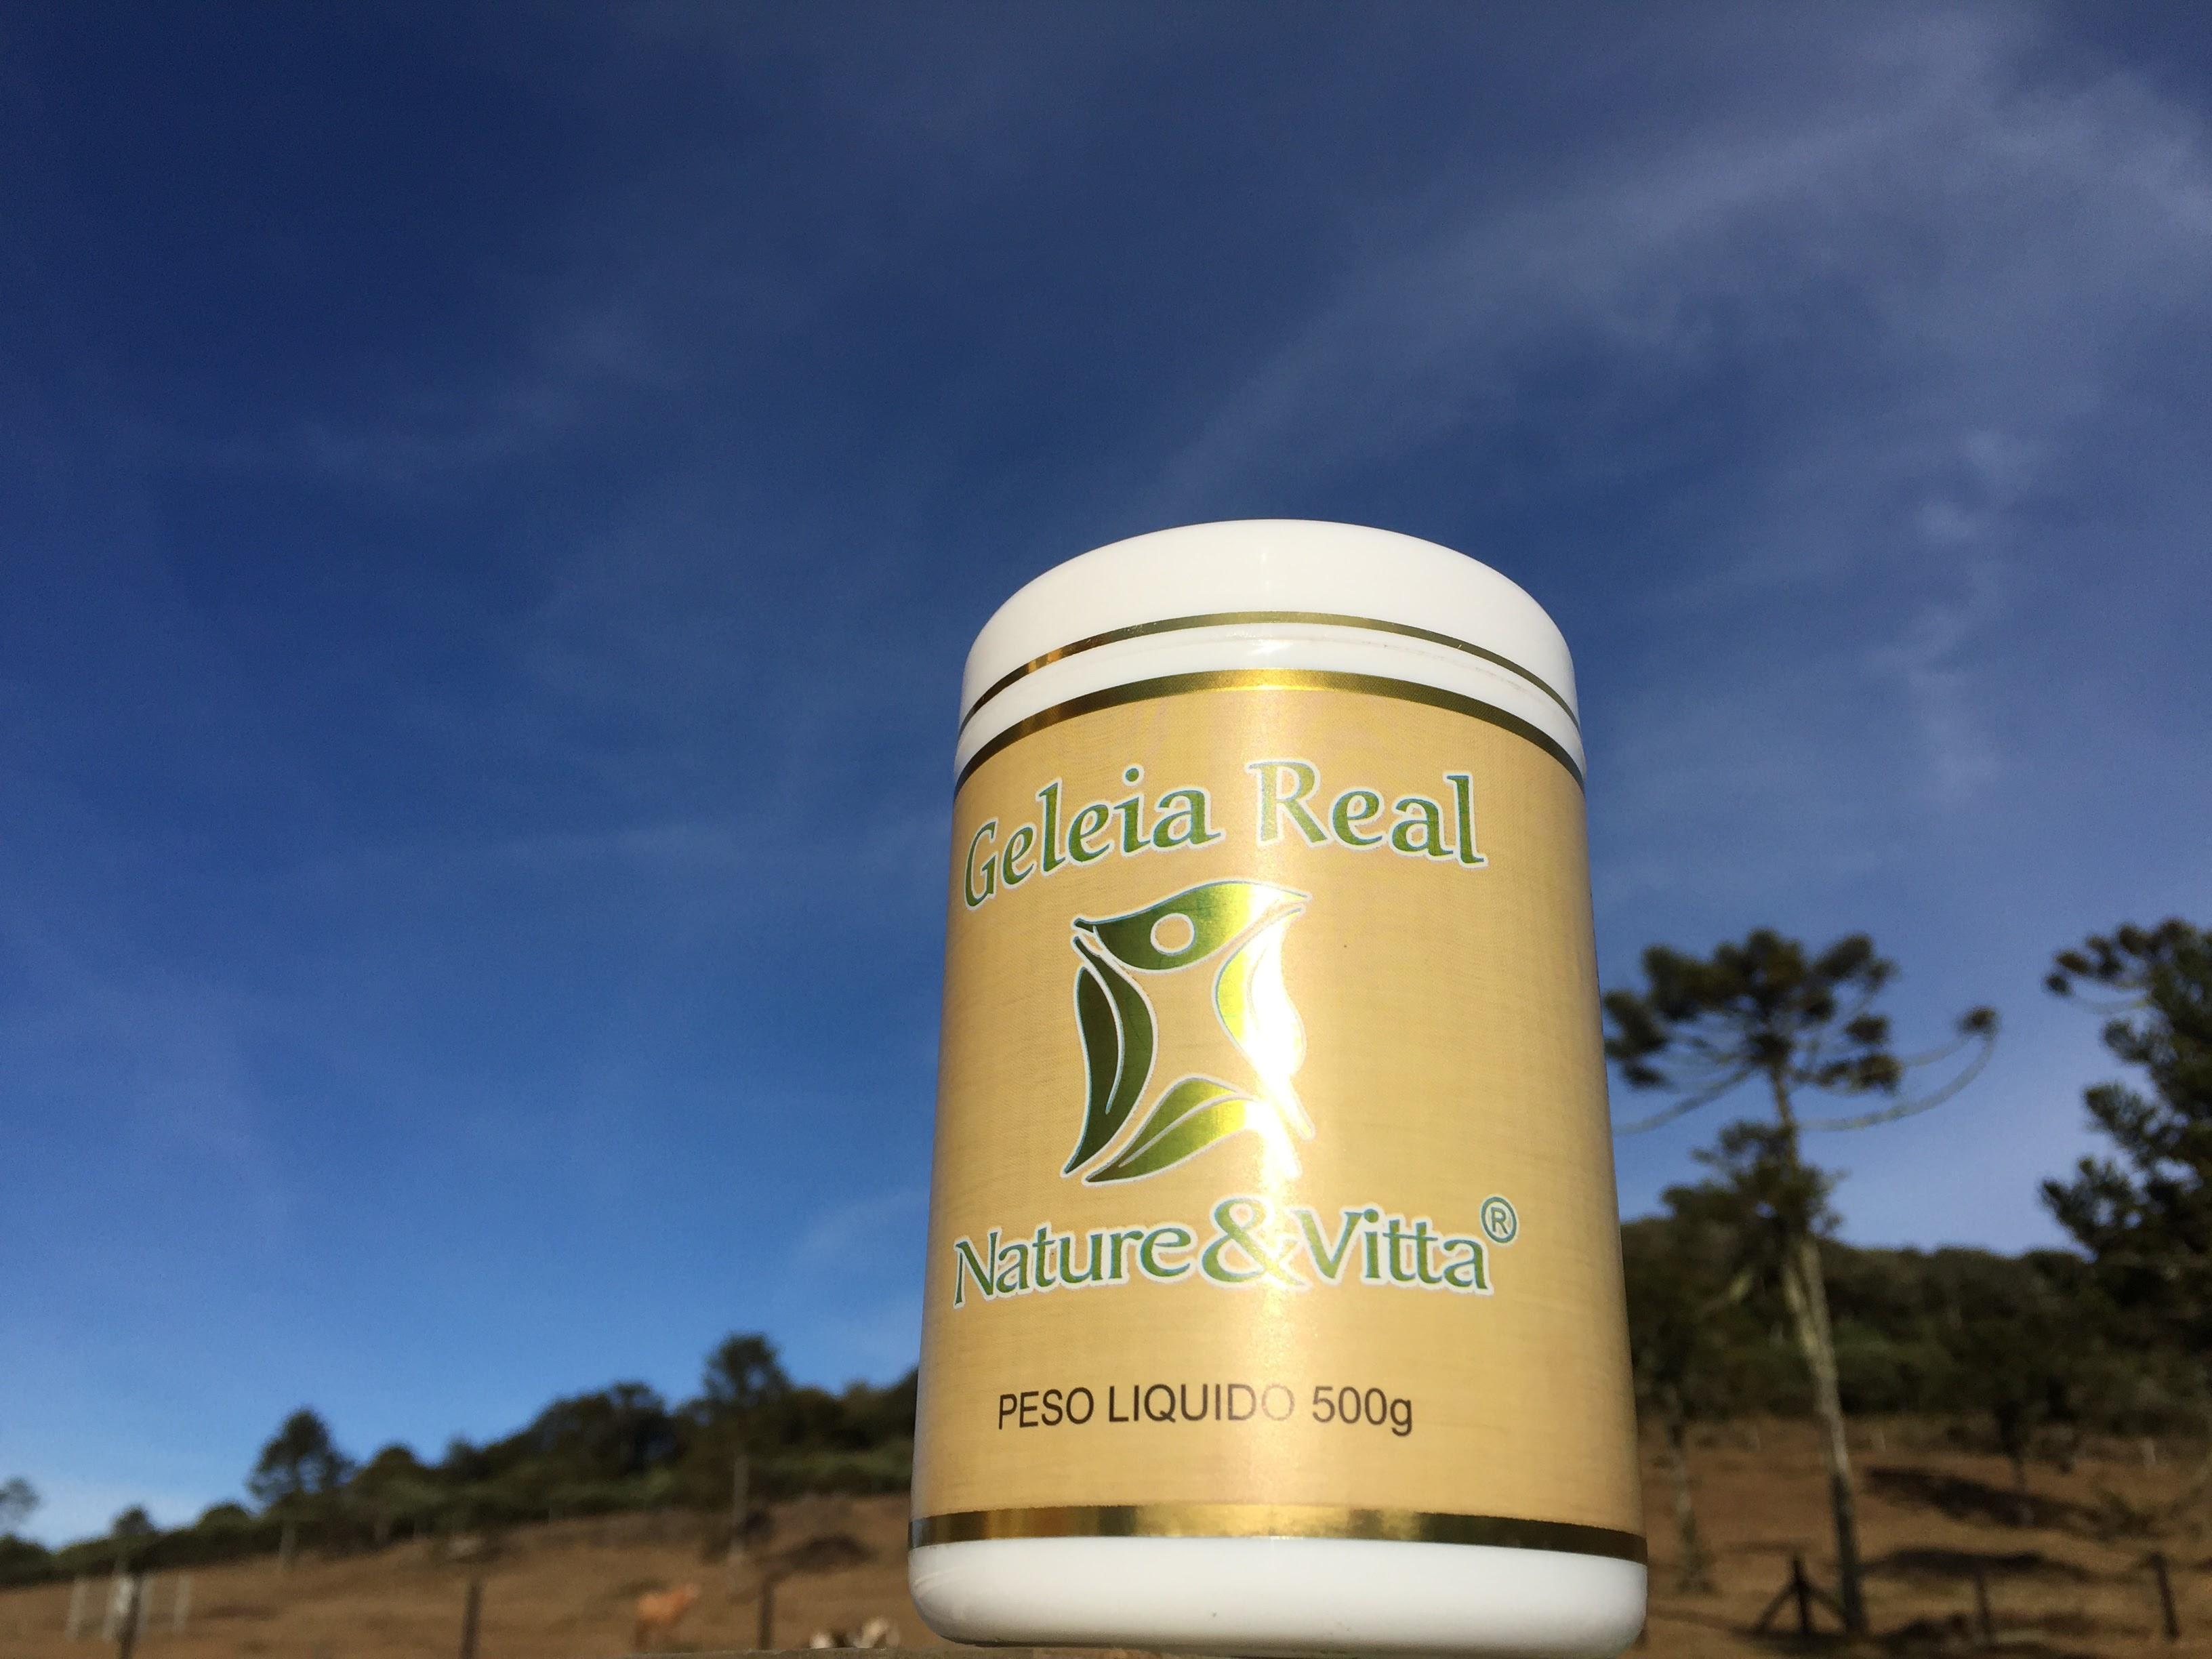 Geleia Real Nature&Vitta 500g